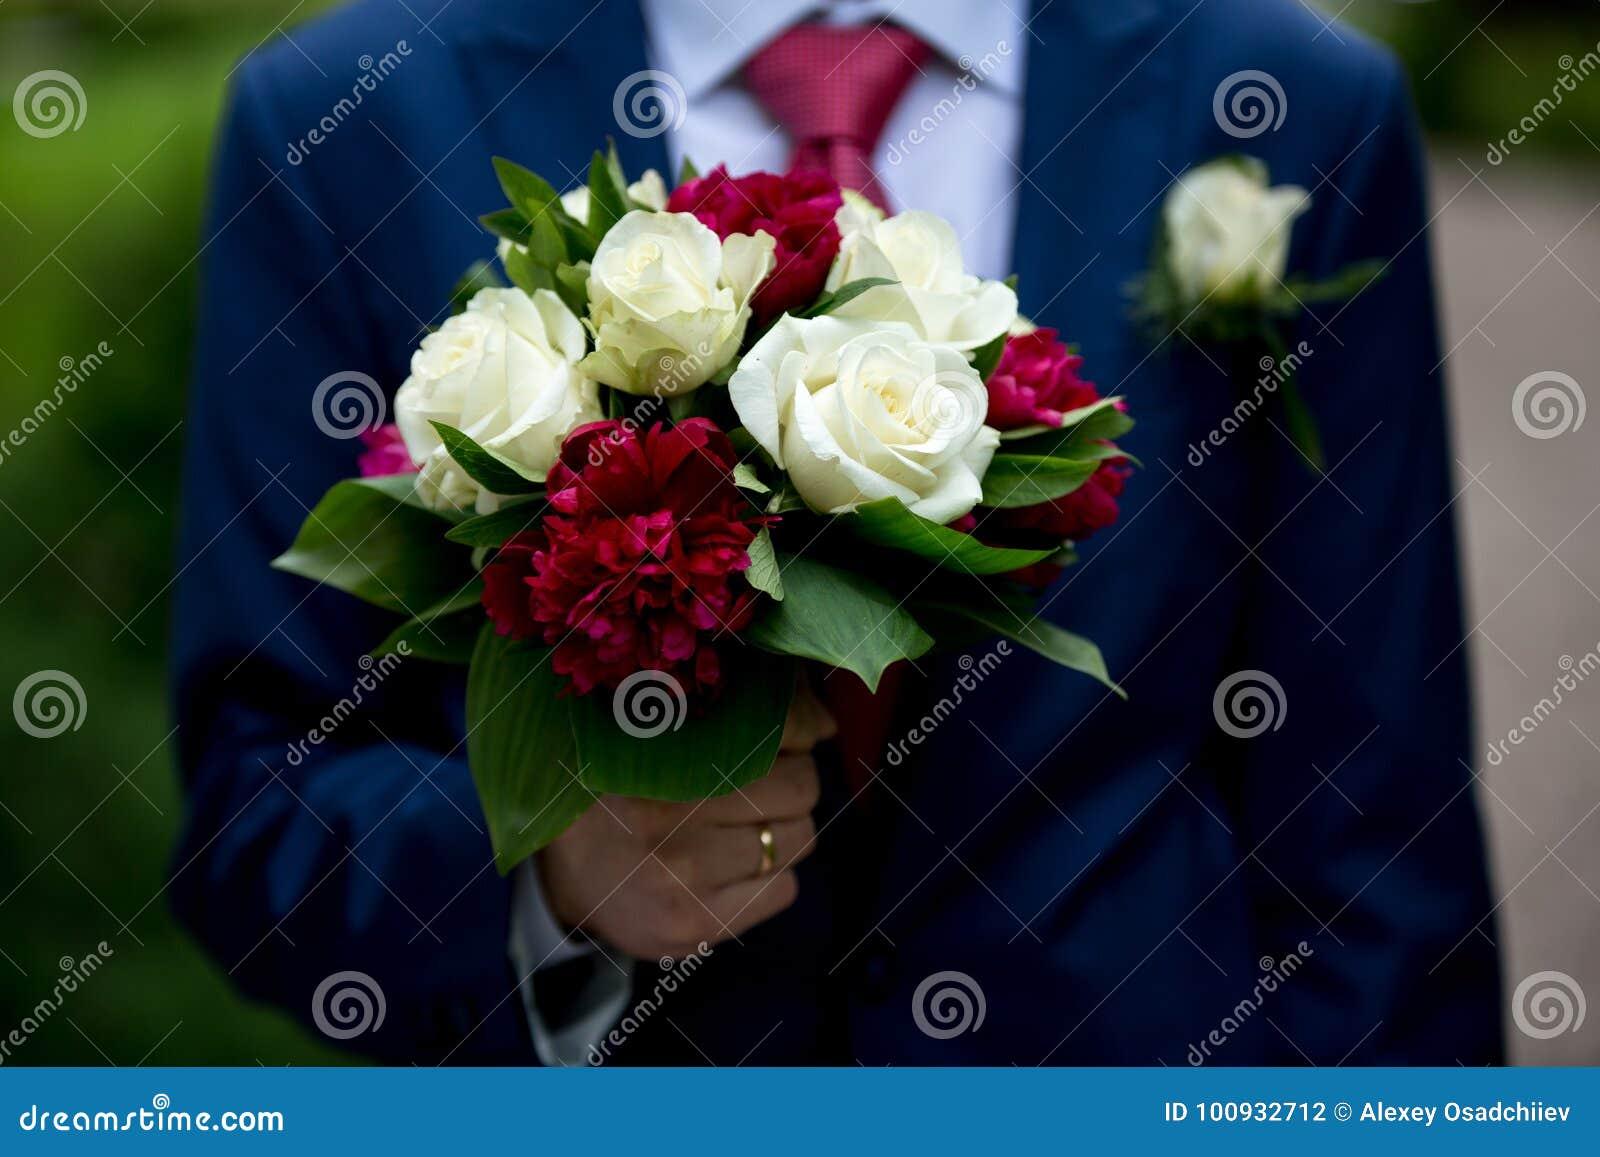 Man with flower bouquet stock photo image of garden 100932712 download comp izmirmasajfo